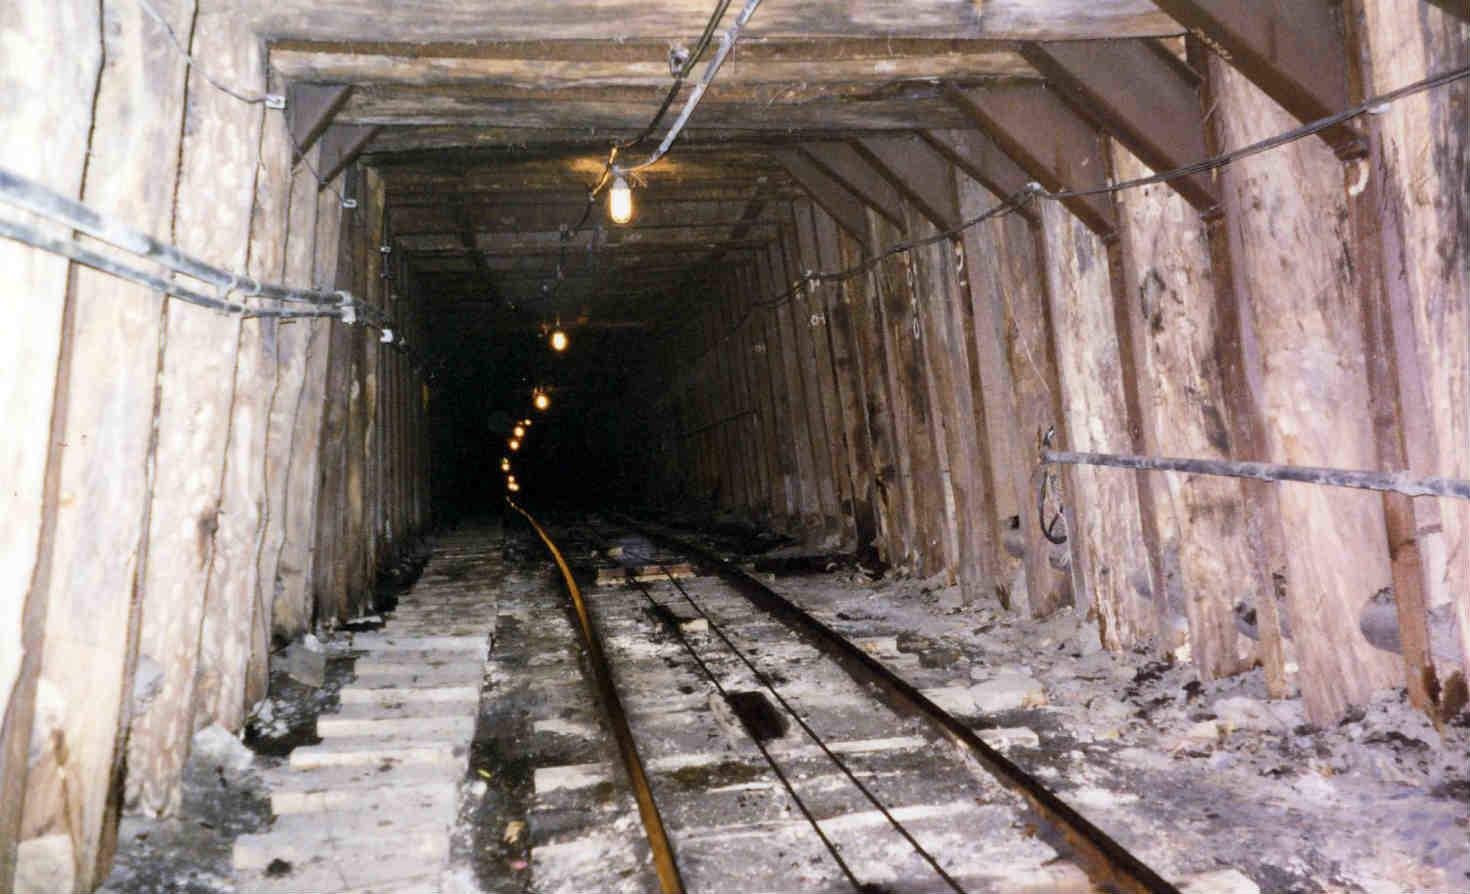 Lackawanna coal mine in Scranton, Pennsylvania